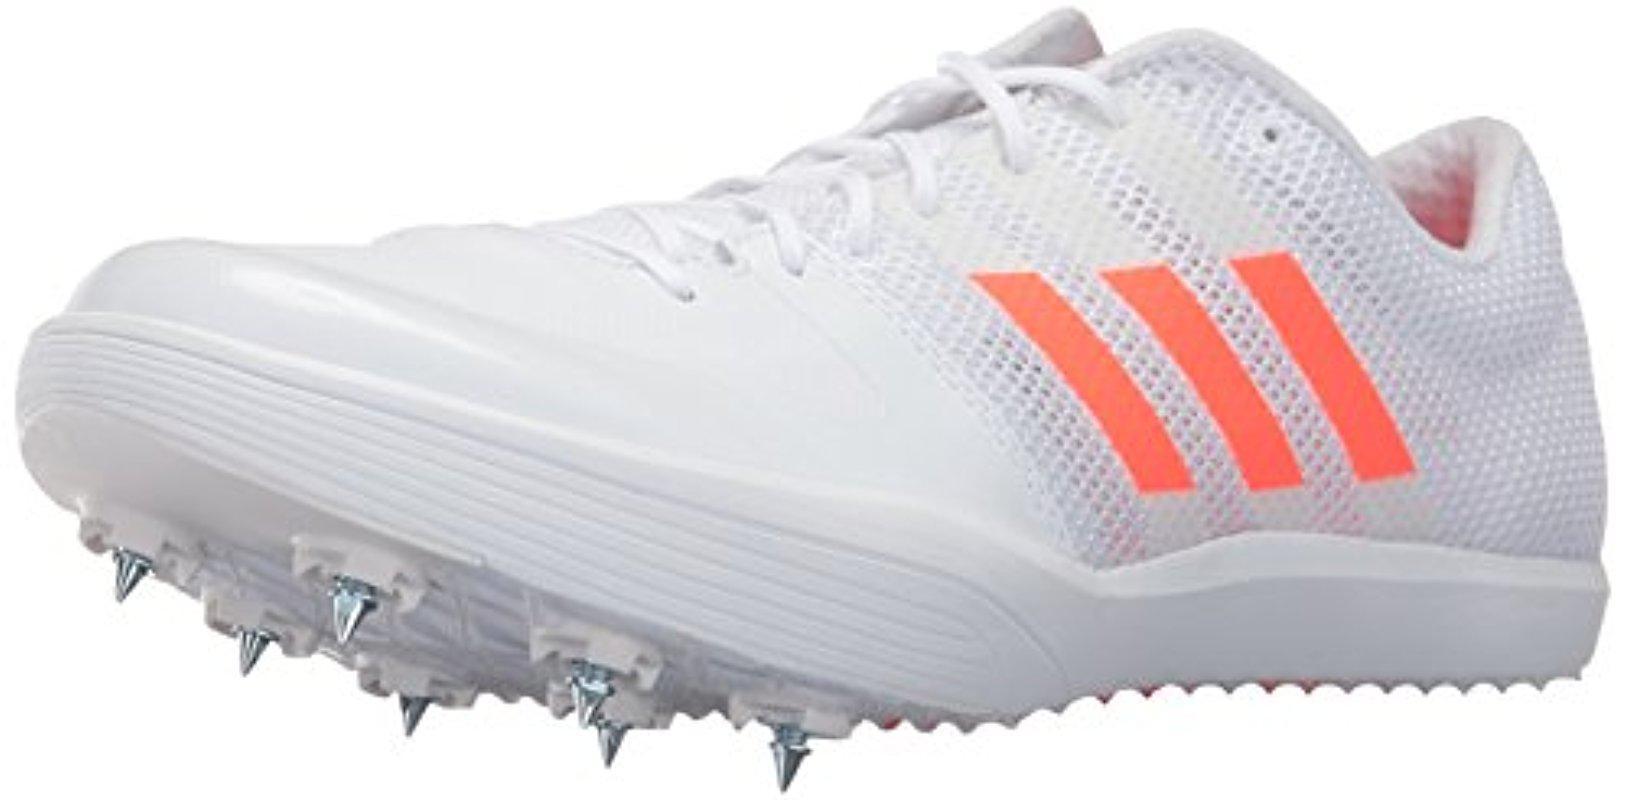 adidas Synthetic Performance Adizero Lj